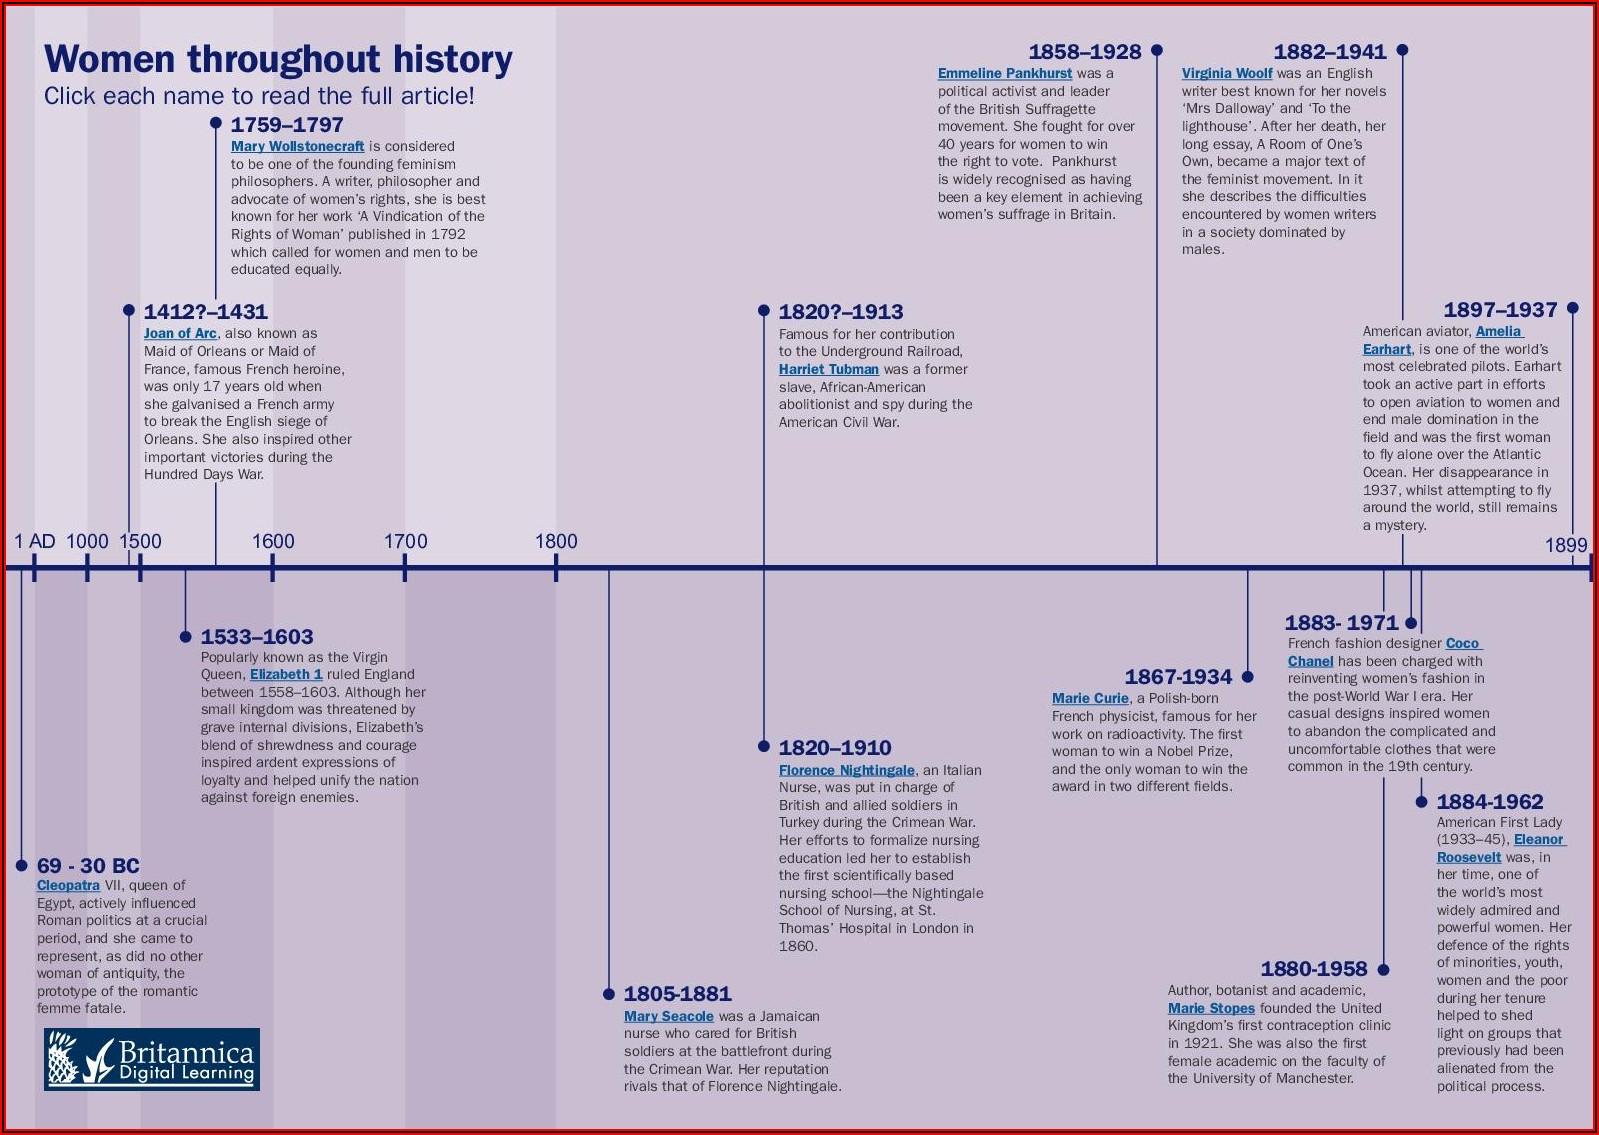 Women's Suffrage Movement Uk Timeline